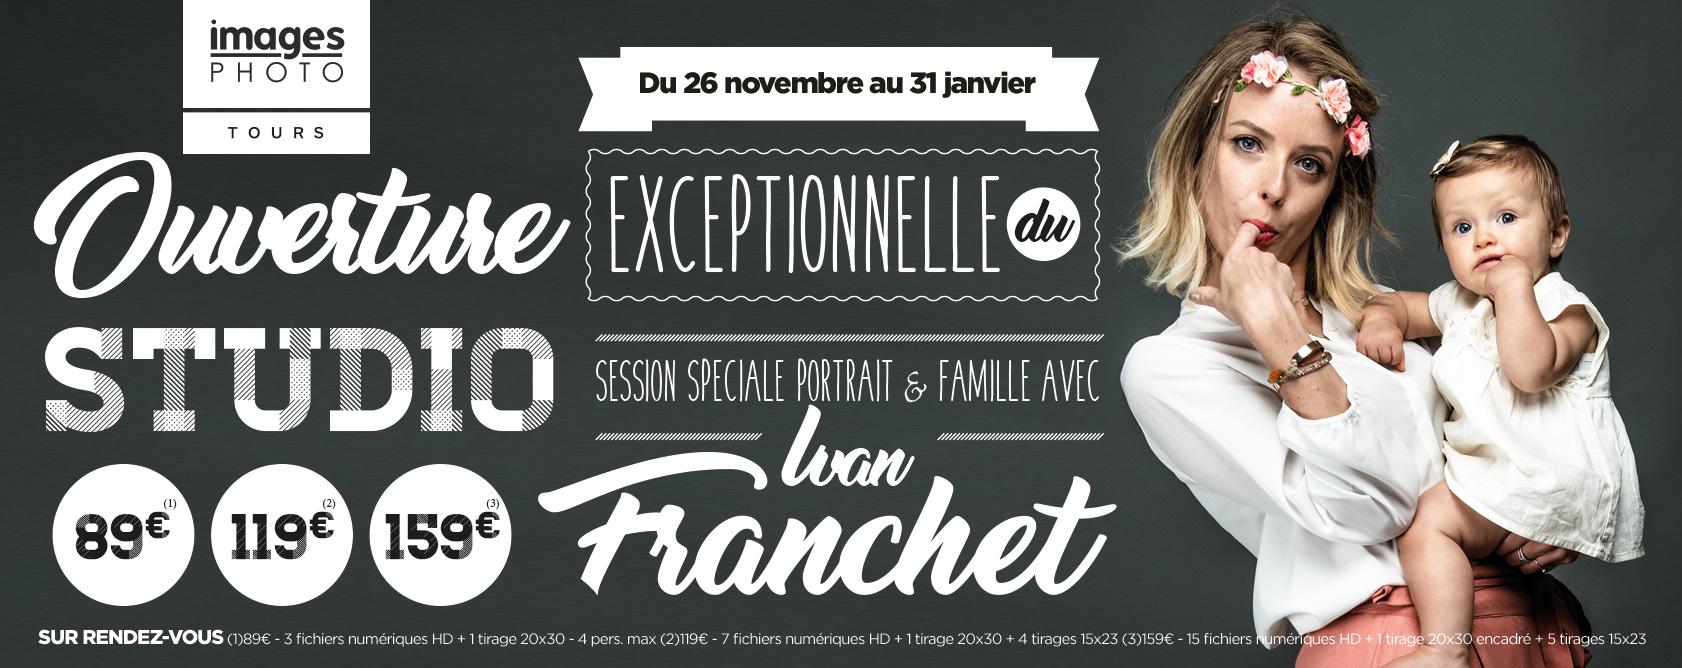 Yvan Franchet 31 01